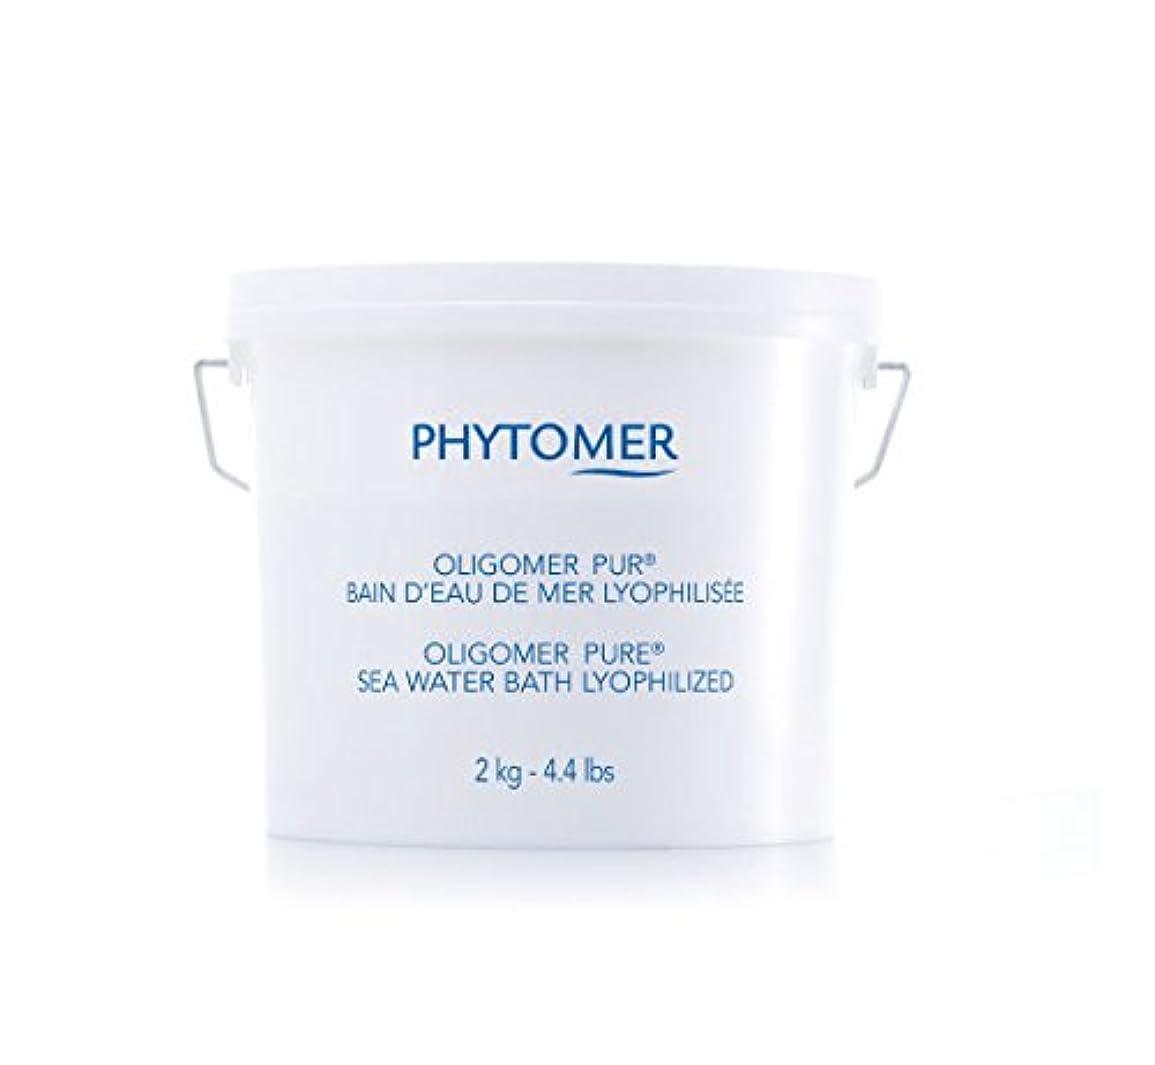 PHYTOMER(フィトメール) オリゴメール ピュア 2kg